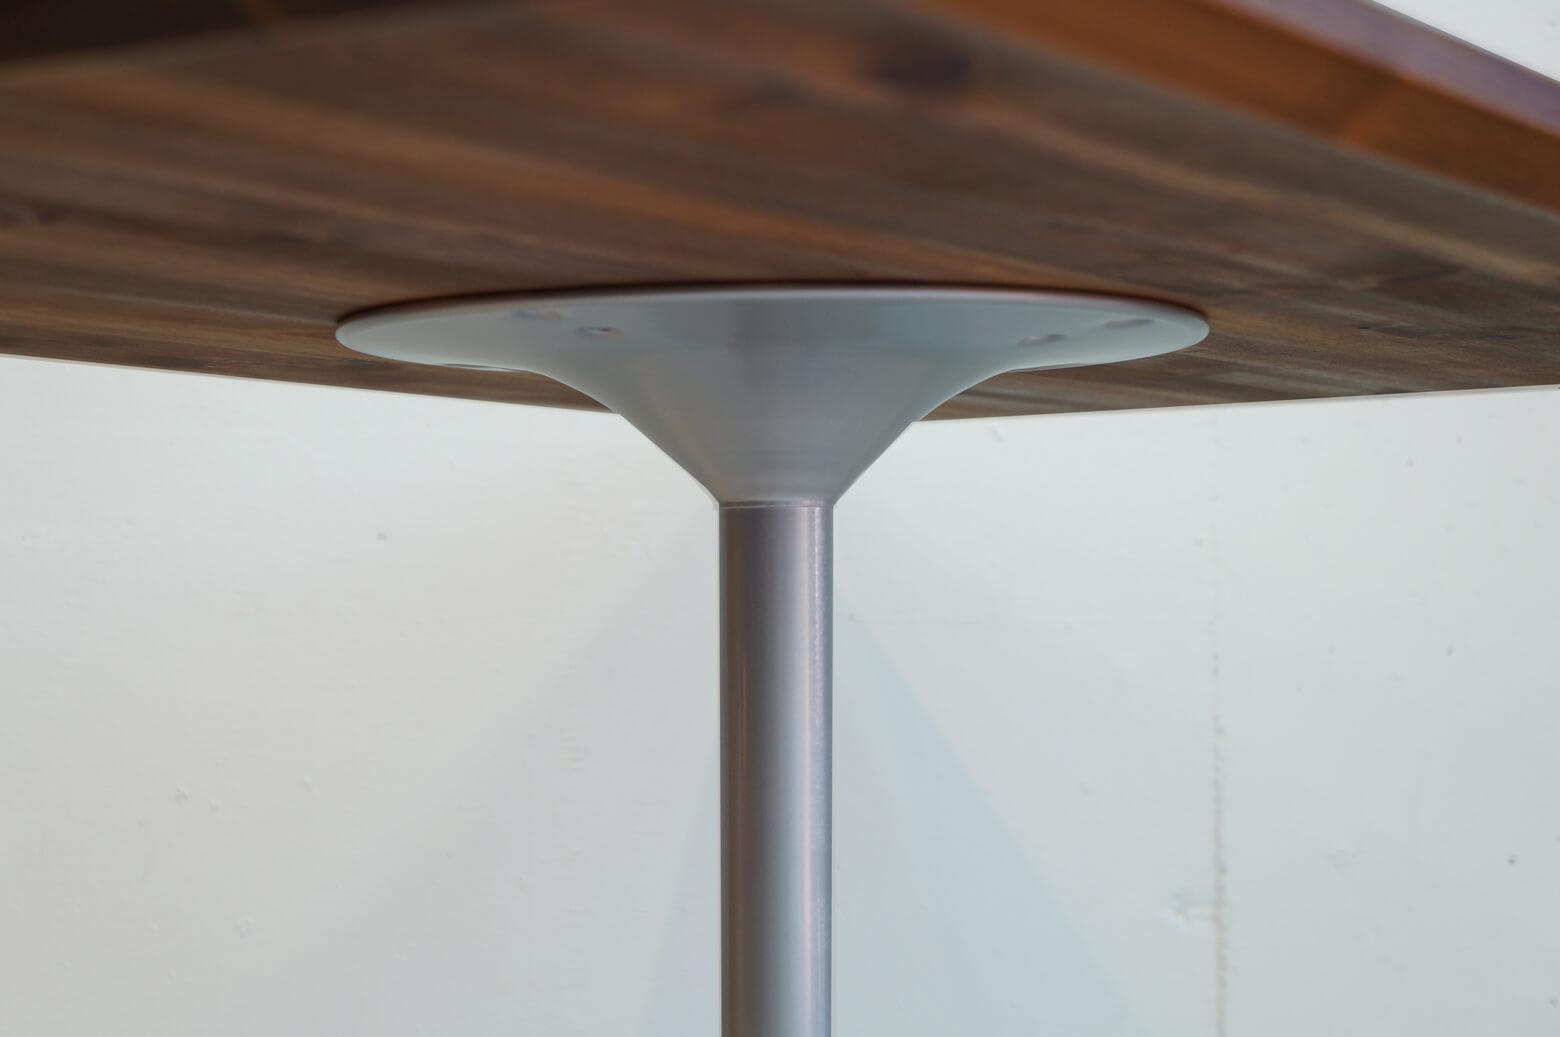 Iron Leg × Wood Cafe Table/鉄脚 × 木 カフェテーブル